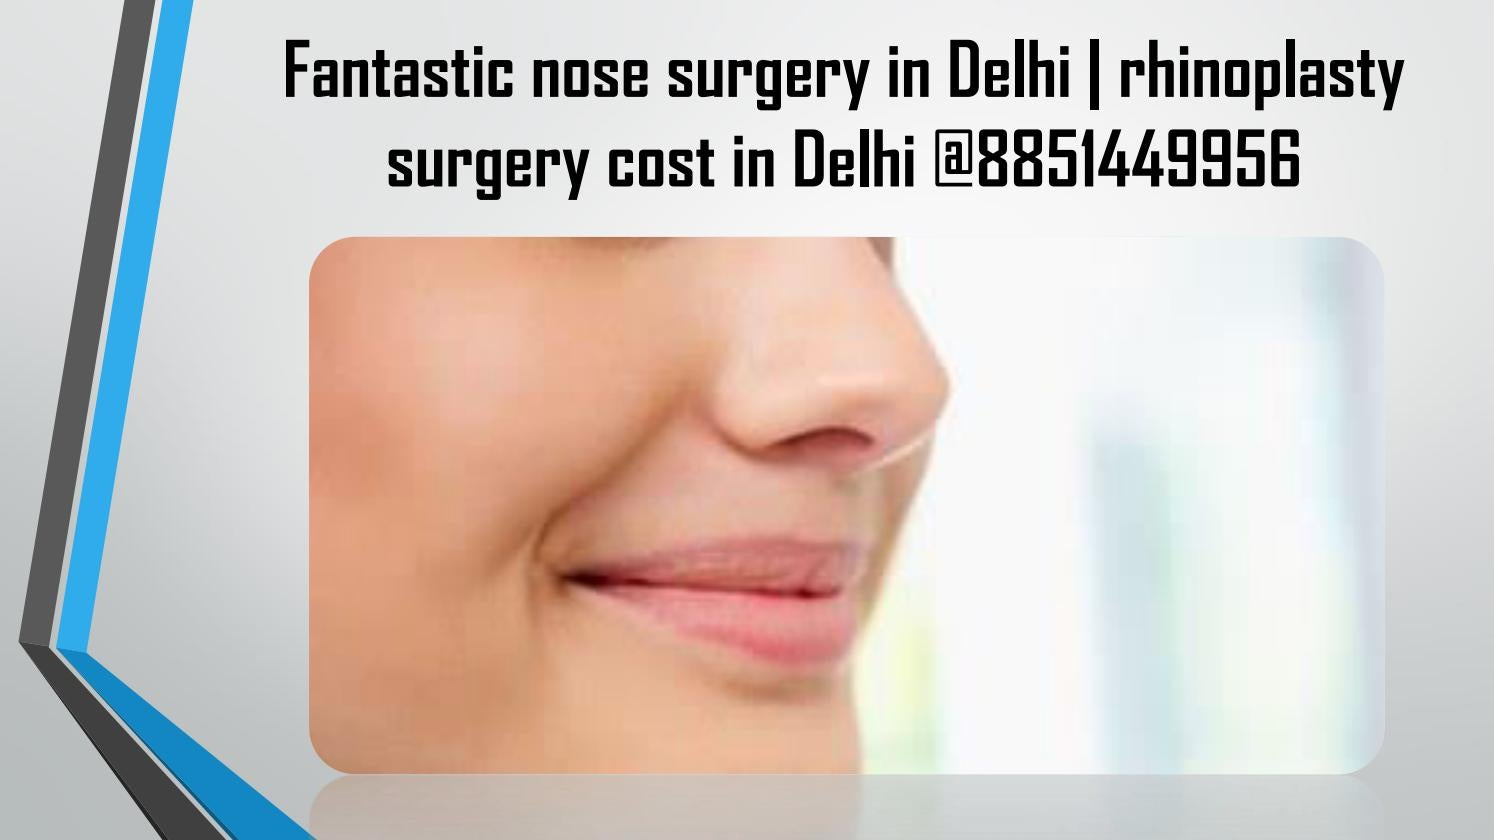 Fantastic Nose Surgery In Delhi Rhinoplasty Surgery Cost In Delhi 8851449956 By Cosmetic Surgery India Issuu